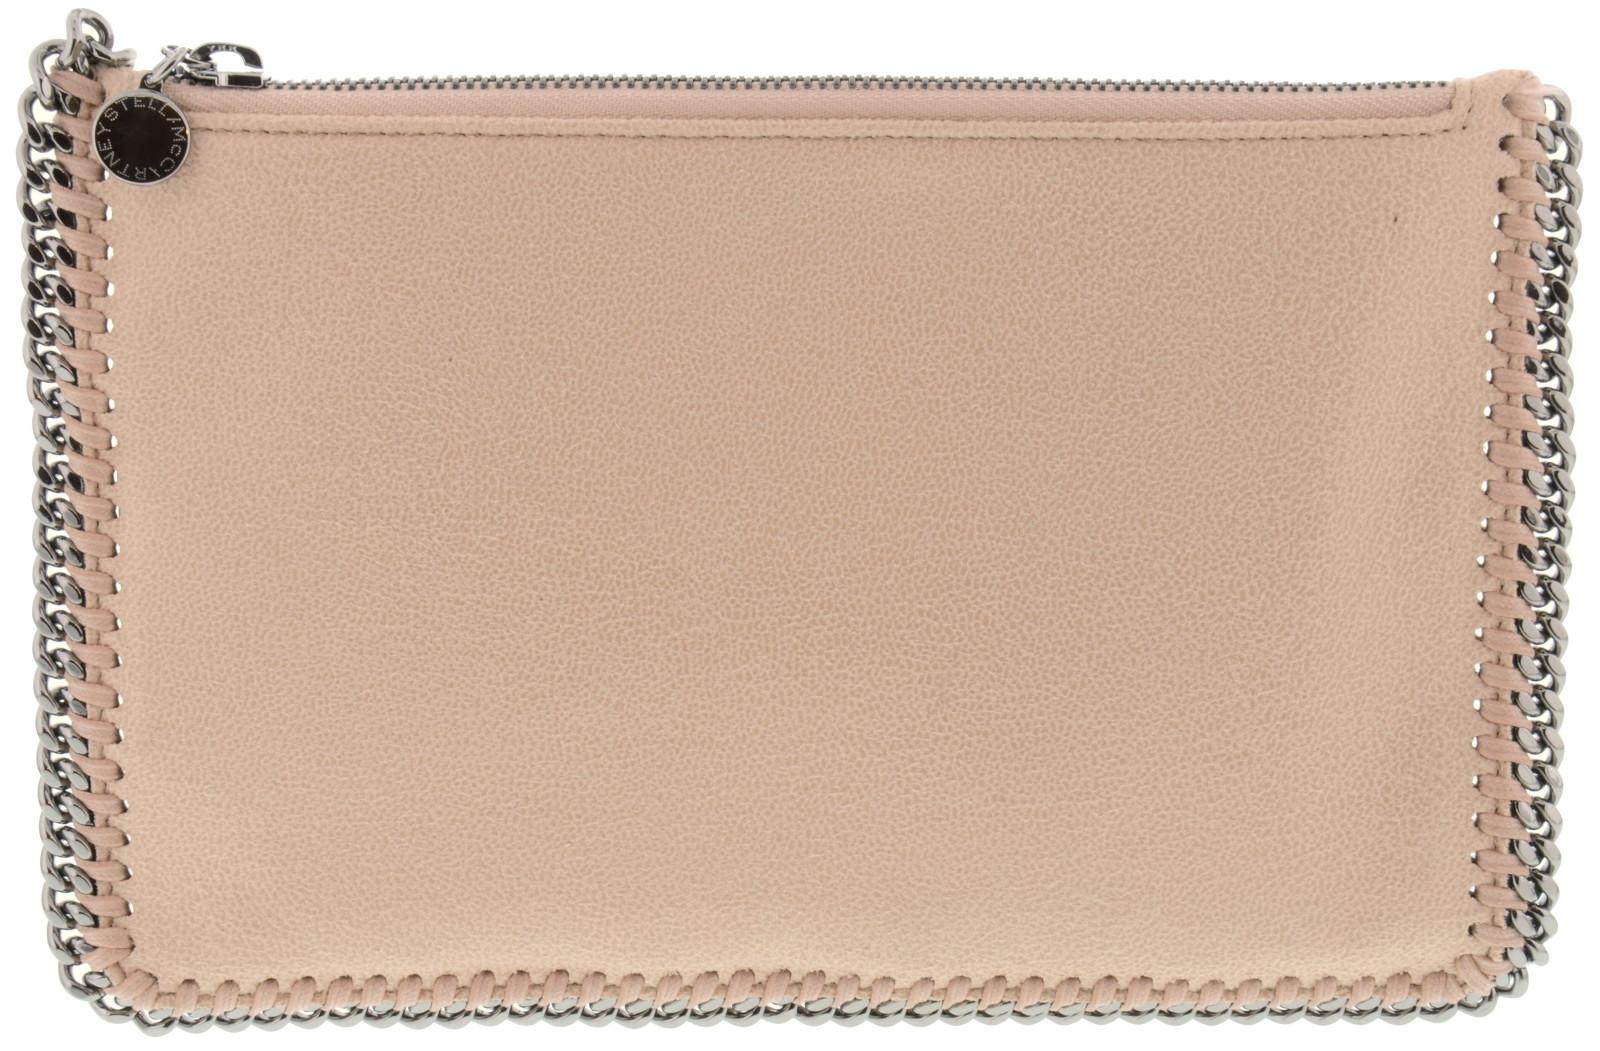 Pochette Soirée Beige : Stella mccartney pochette colore cipria chiusura zip dime